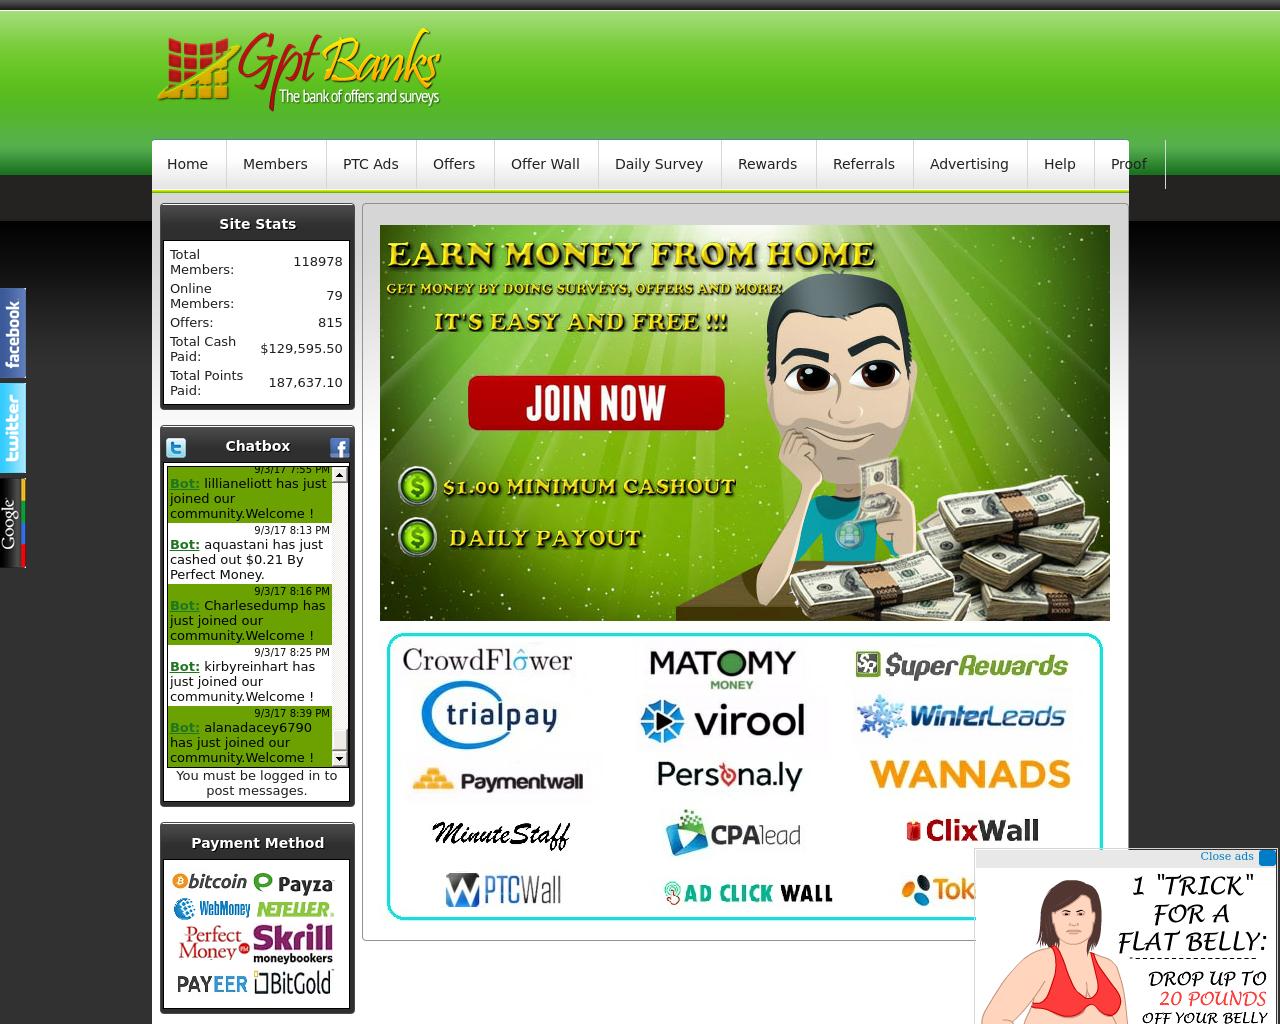 GPTBANKS-Advertising-Reviews-Pricing